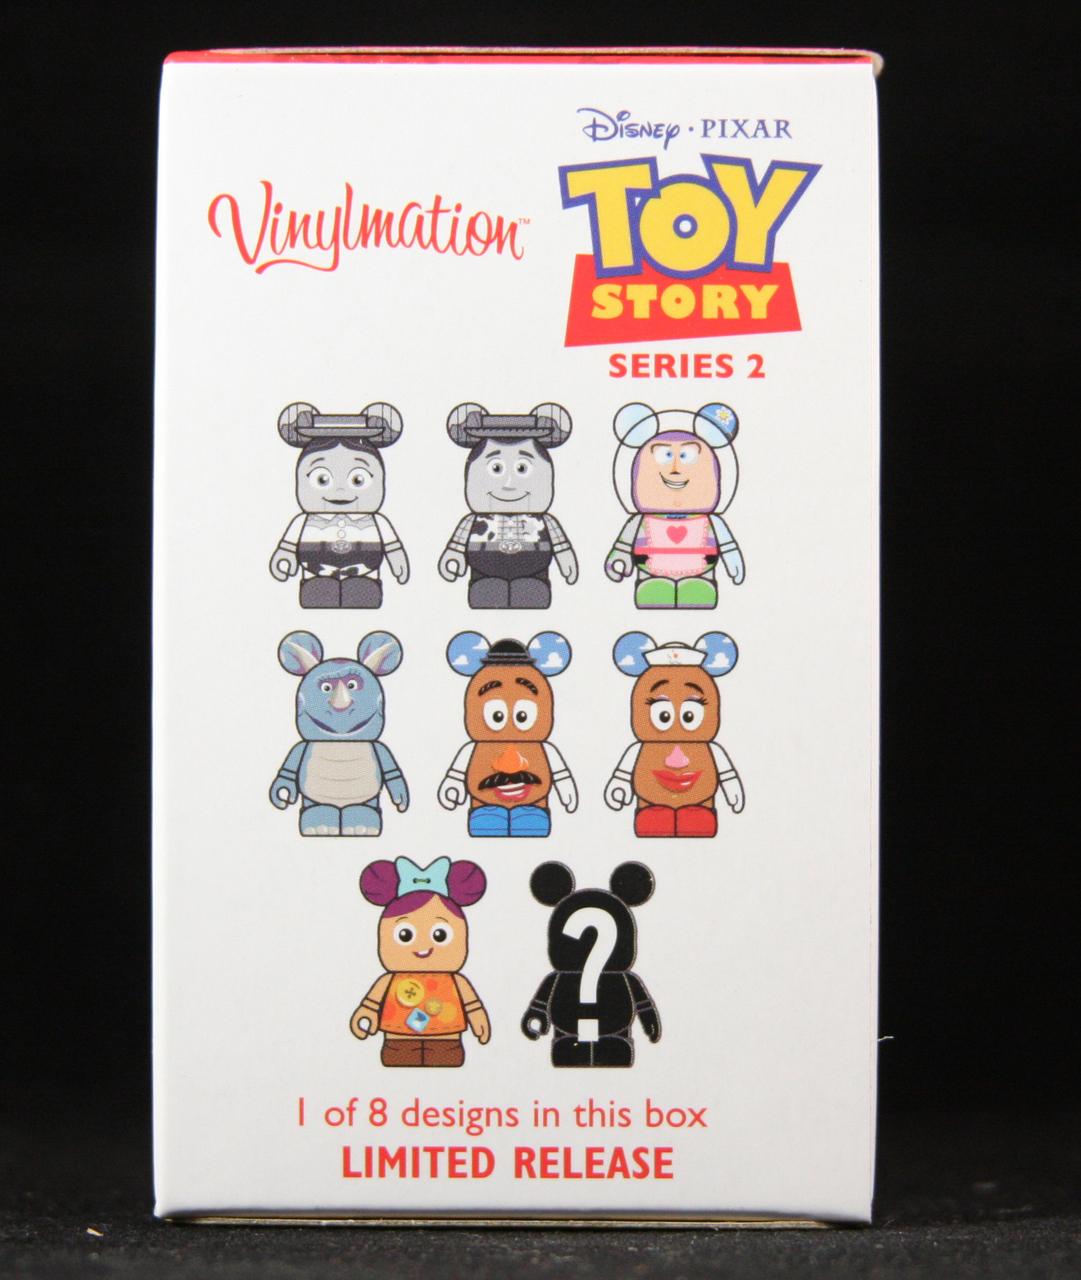 Vinylmation Toy Story Series 2 Blind Box Blindboxes